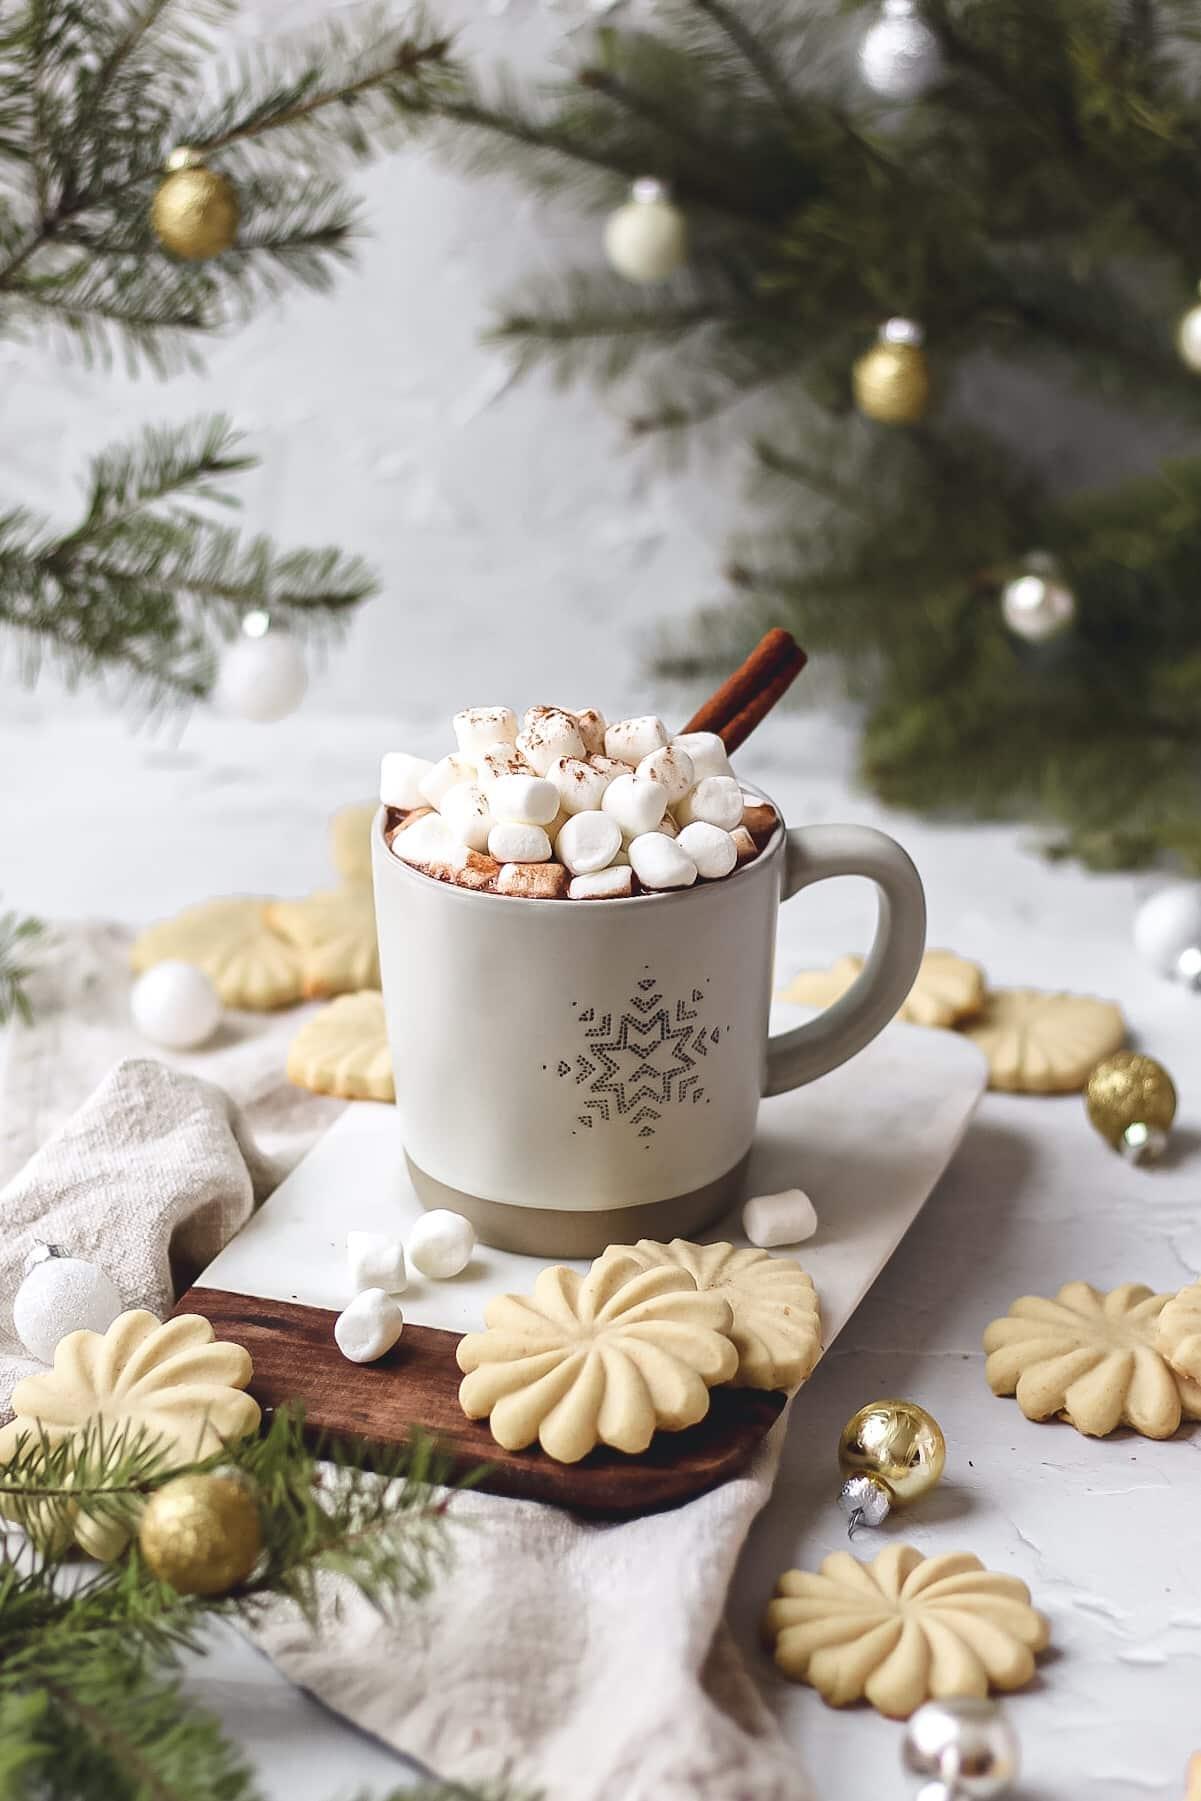 homemade cinnamon hot chocolate